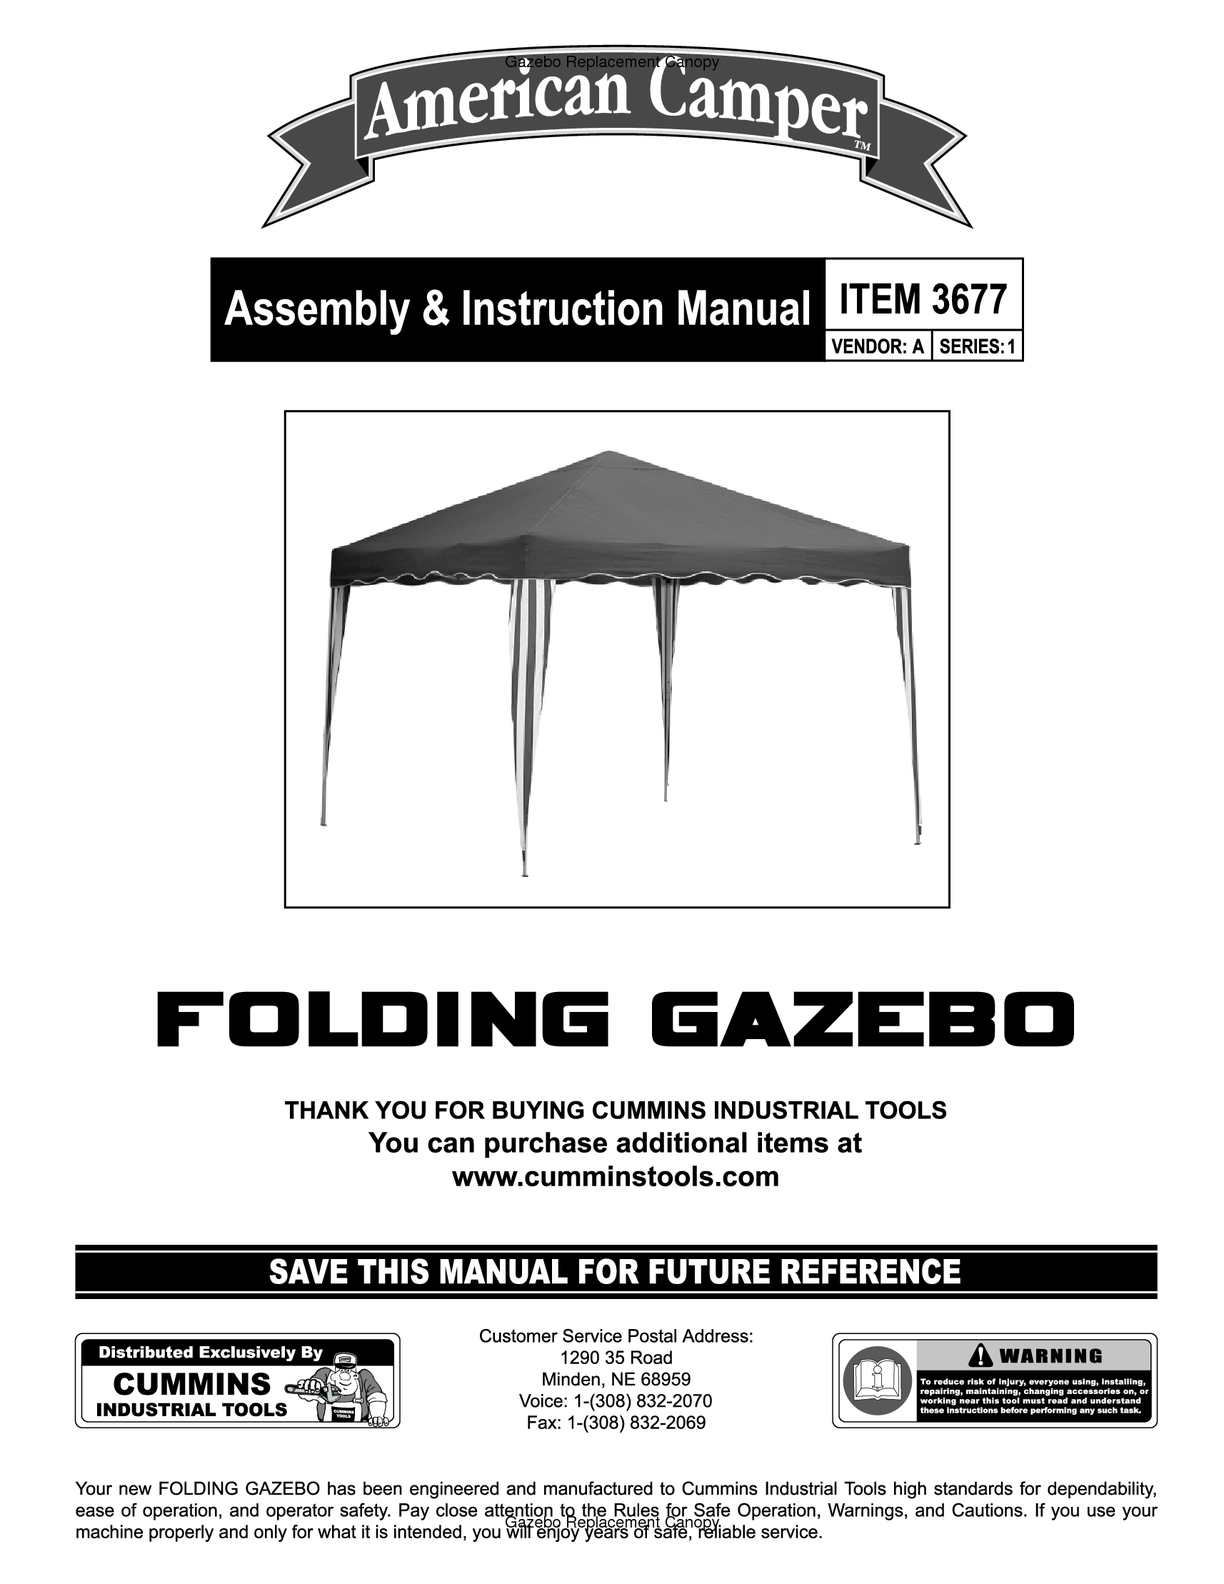 Calamo American Camper Folding Gazebo Assembly And Instruction